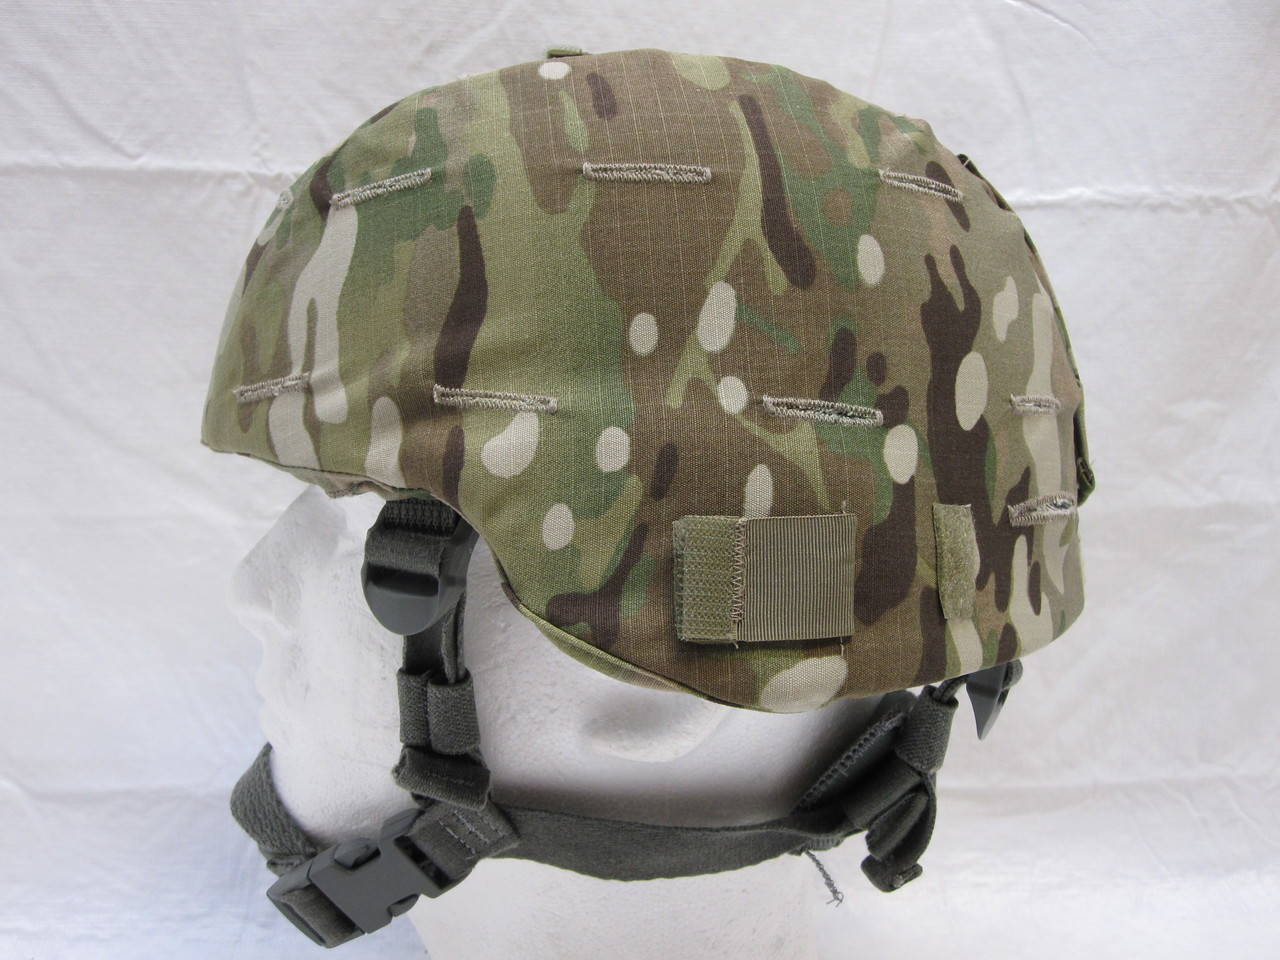 ARMY OCP ADVANCED COMBAT HELMET ACH/MICH MADE W/ KEVLAR MEDIUM MULTICAM COVER